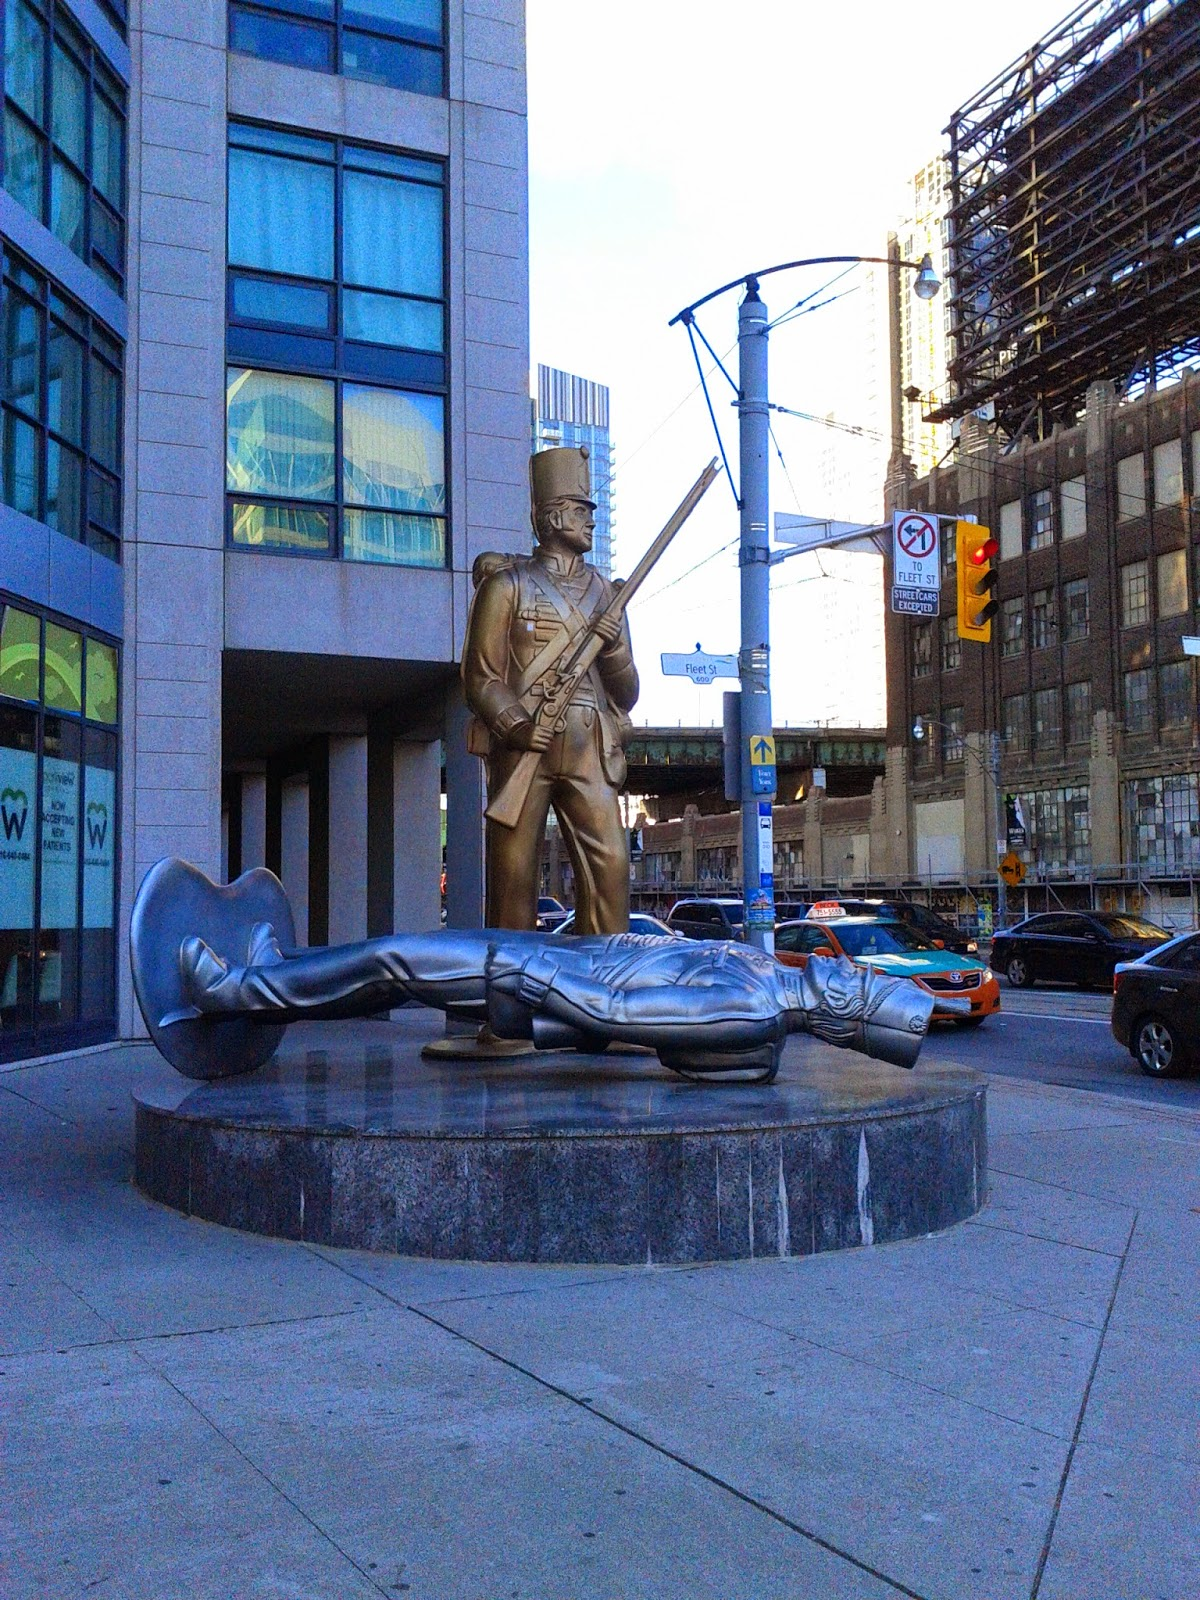 Fort York soldier statue